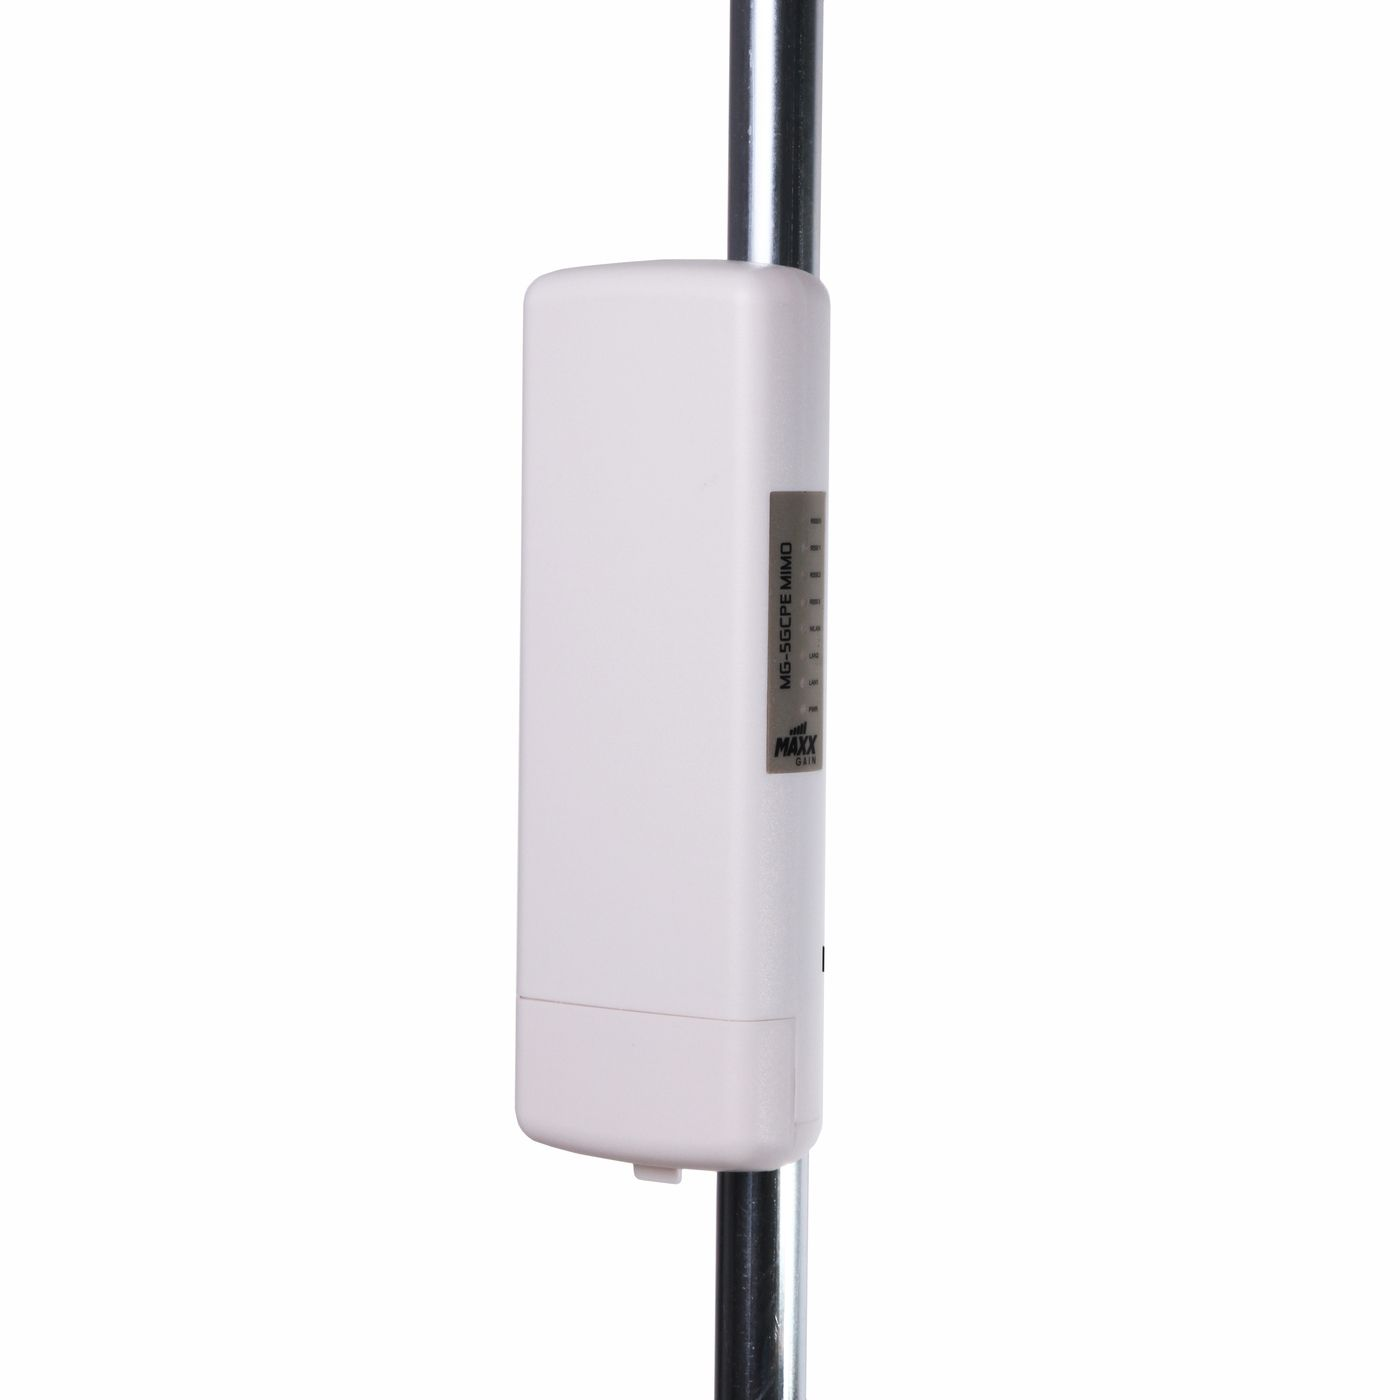 CPE Wi-Fi 5GHZ Antena 14 DBI MG-5GCPE mimo 2x2 OIW